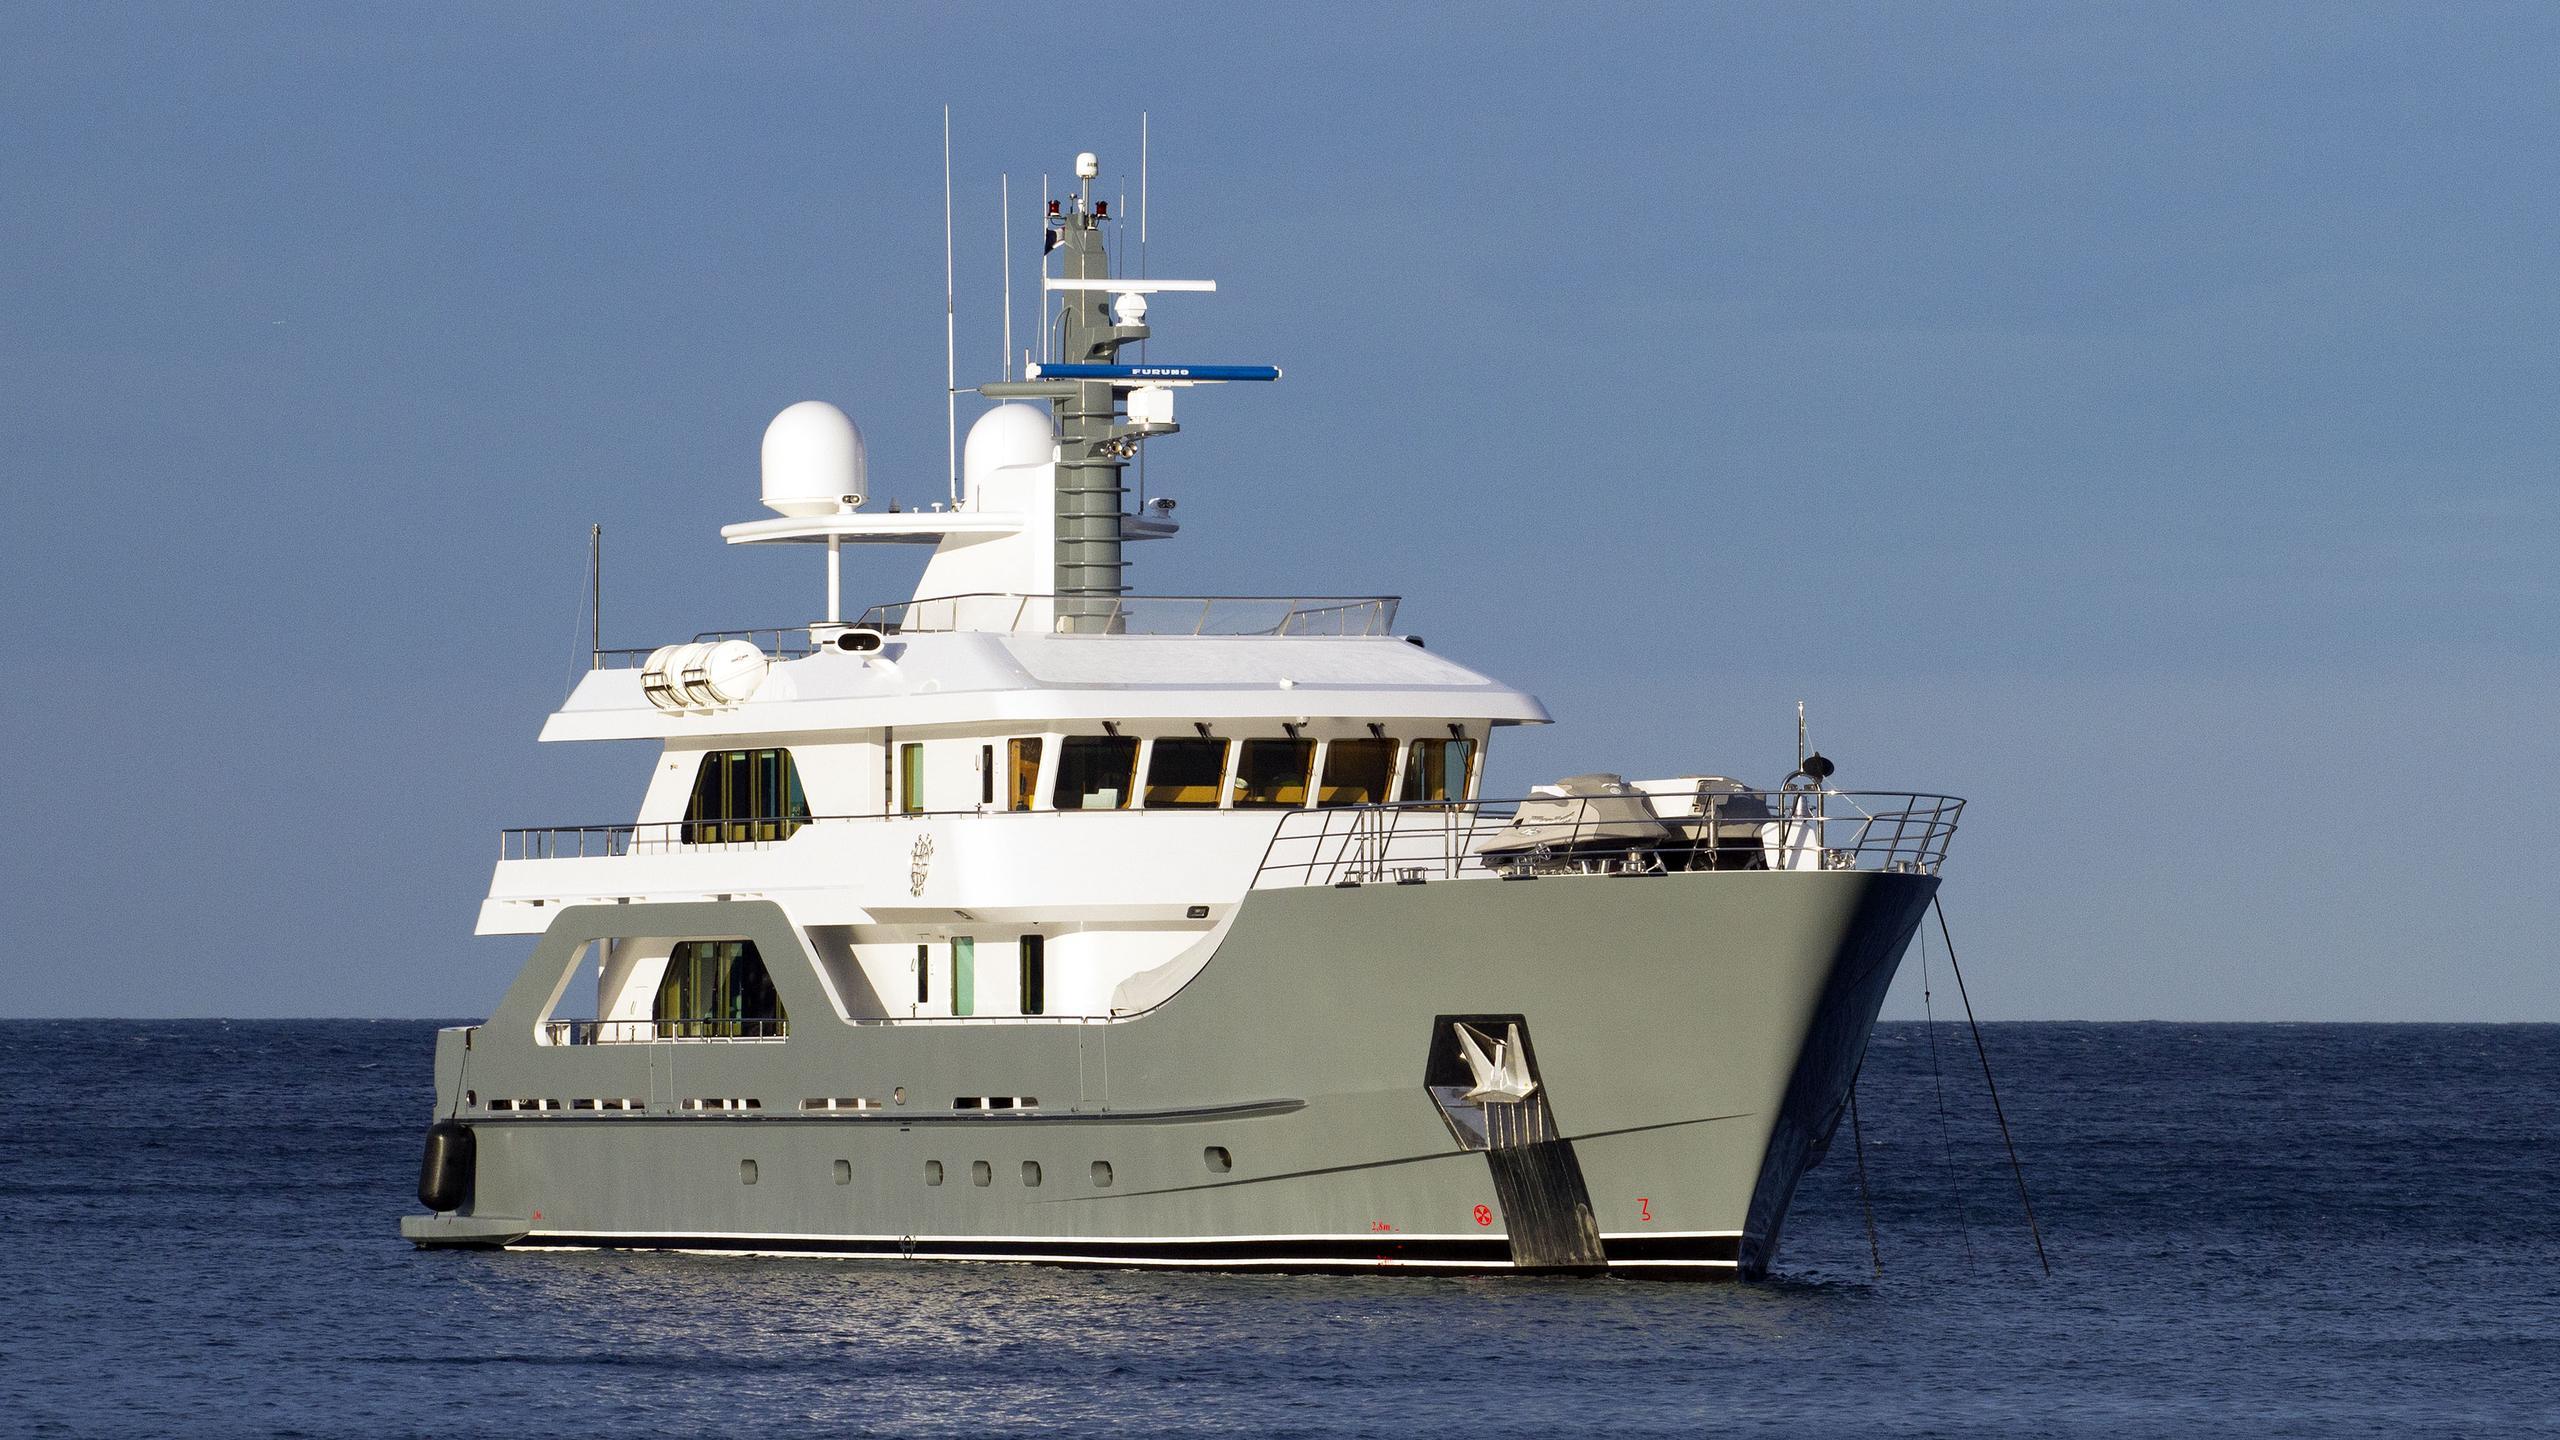 far-far-away-motor-yacht-inace-explorer-120-2012-37m-half-profile